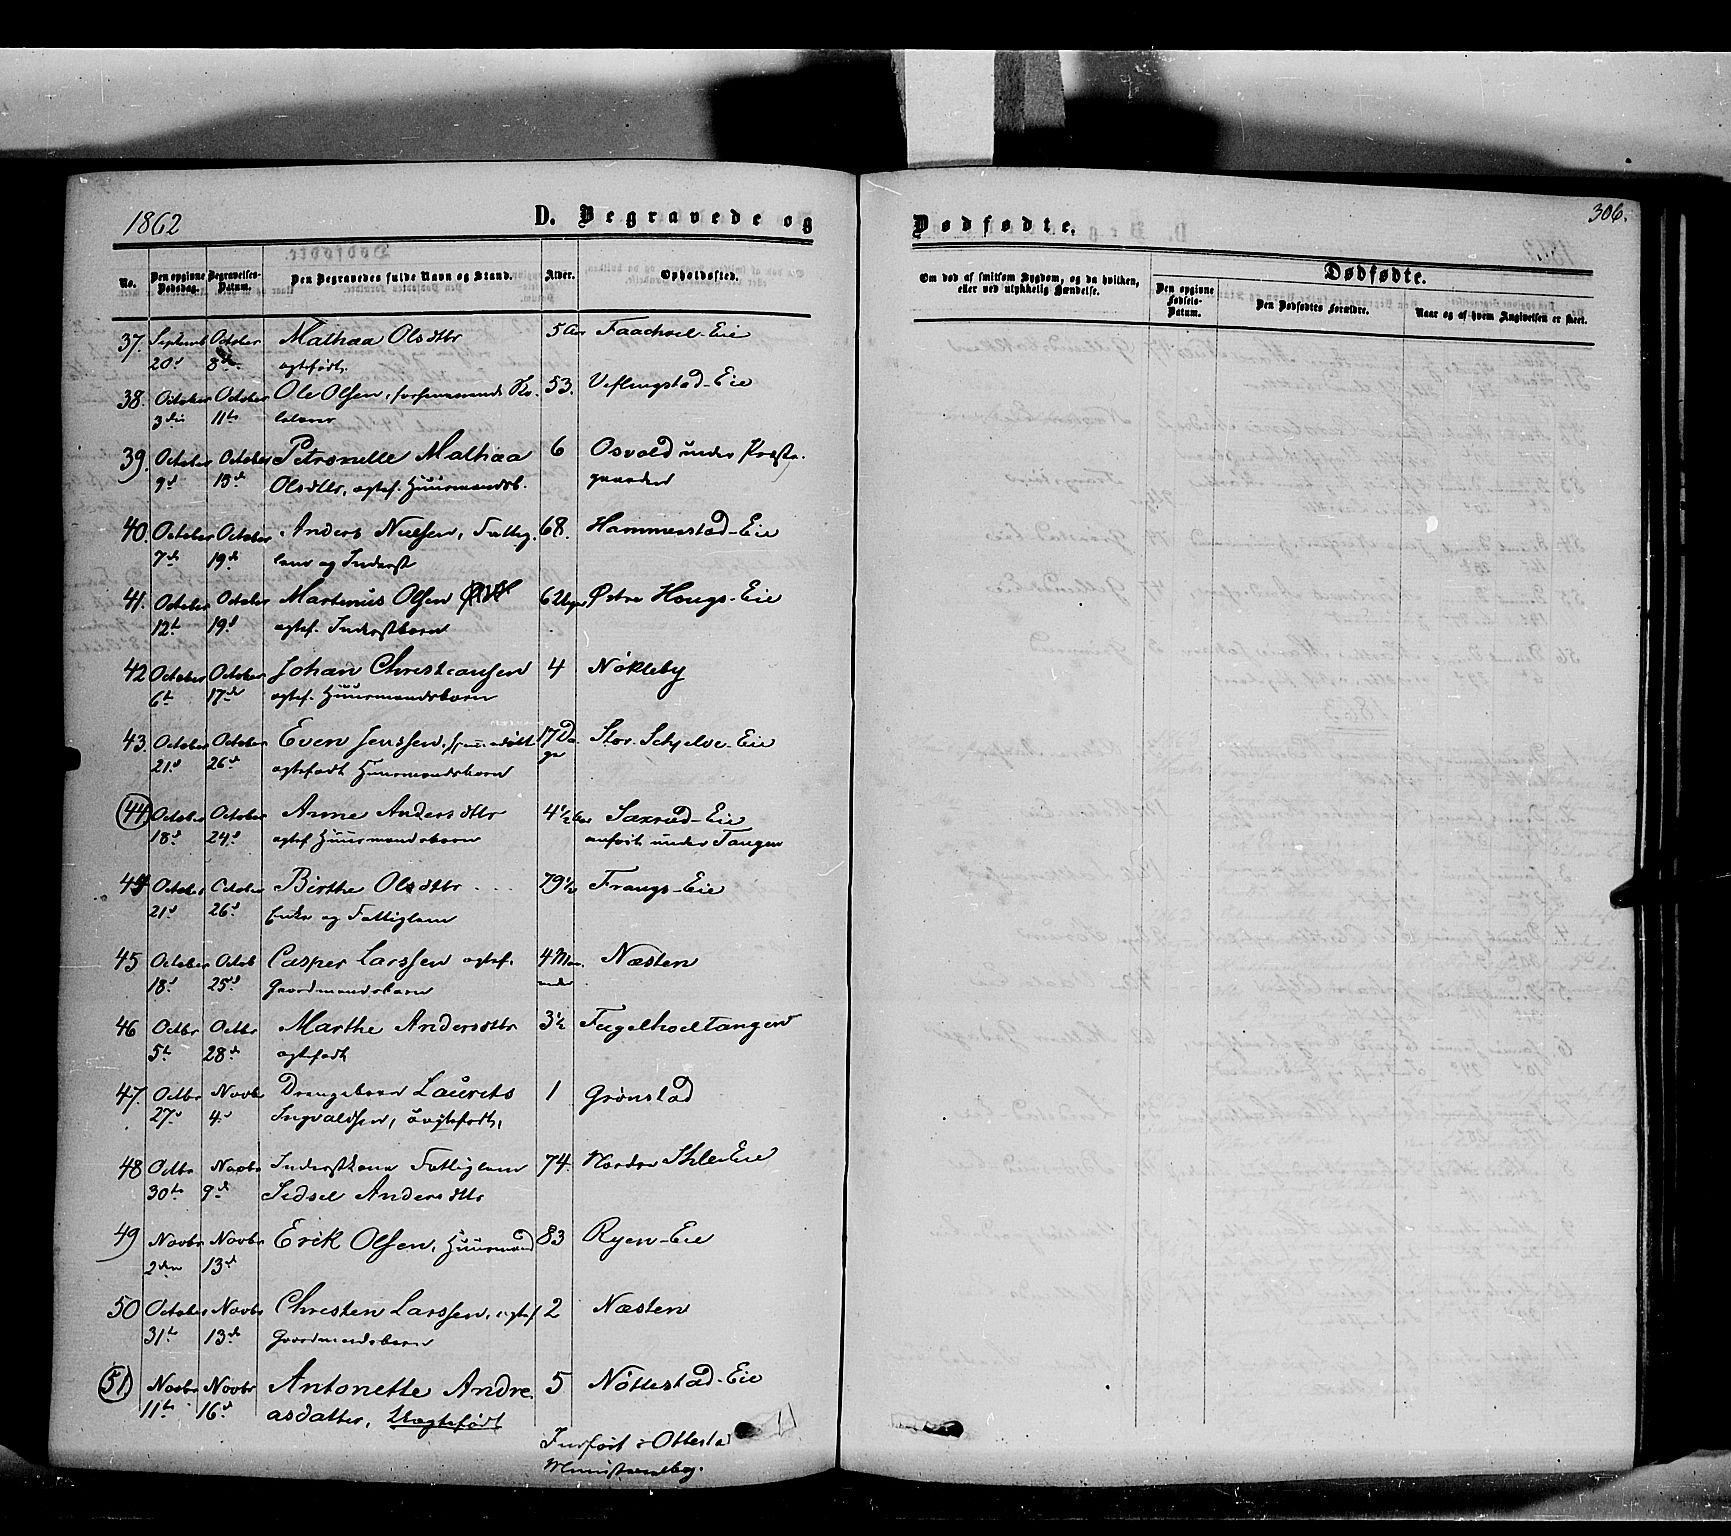 SAH, Stange prestekontor, K/L0013: Ministerialbok nr. 13, 1862-1879, s. 306